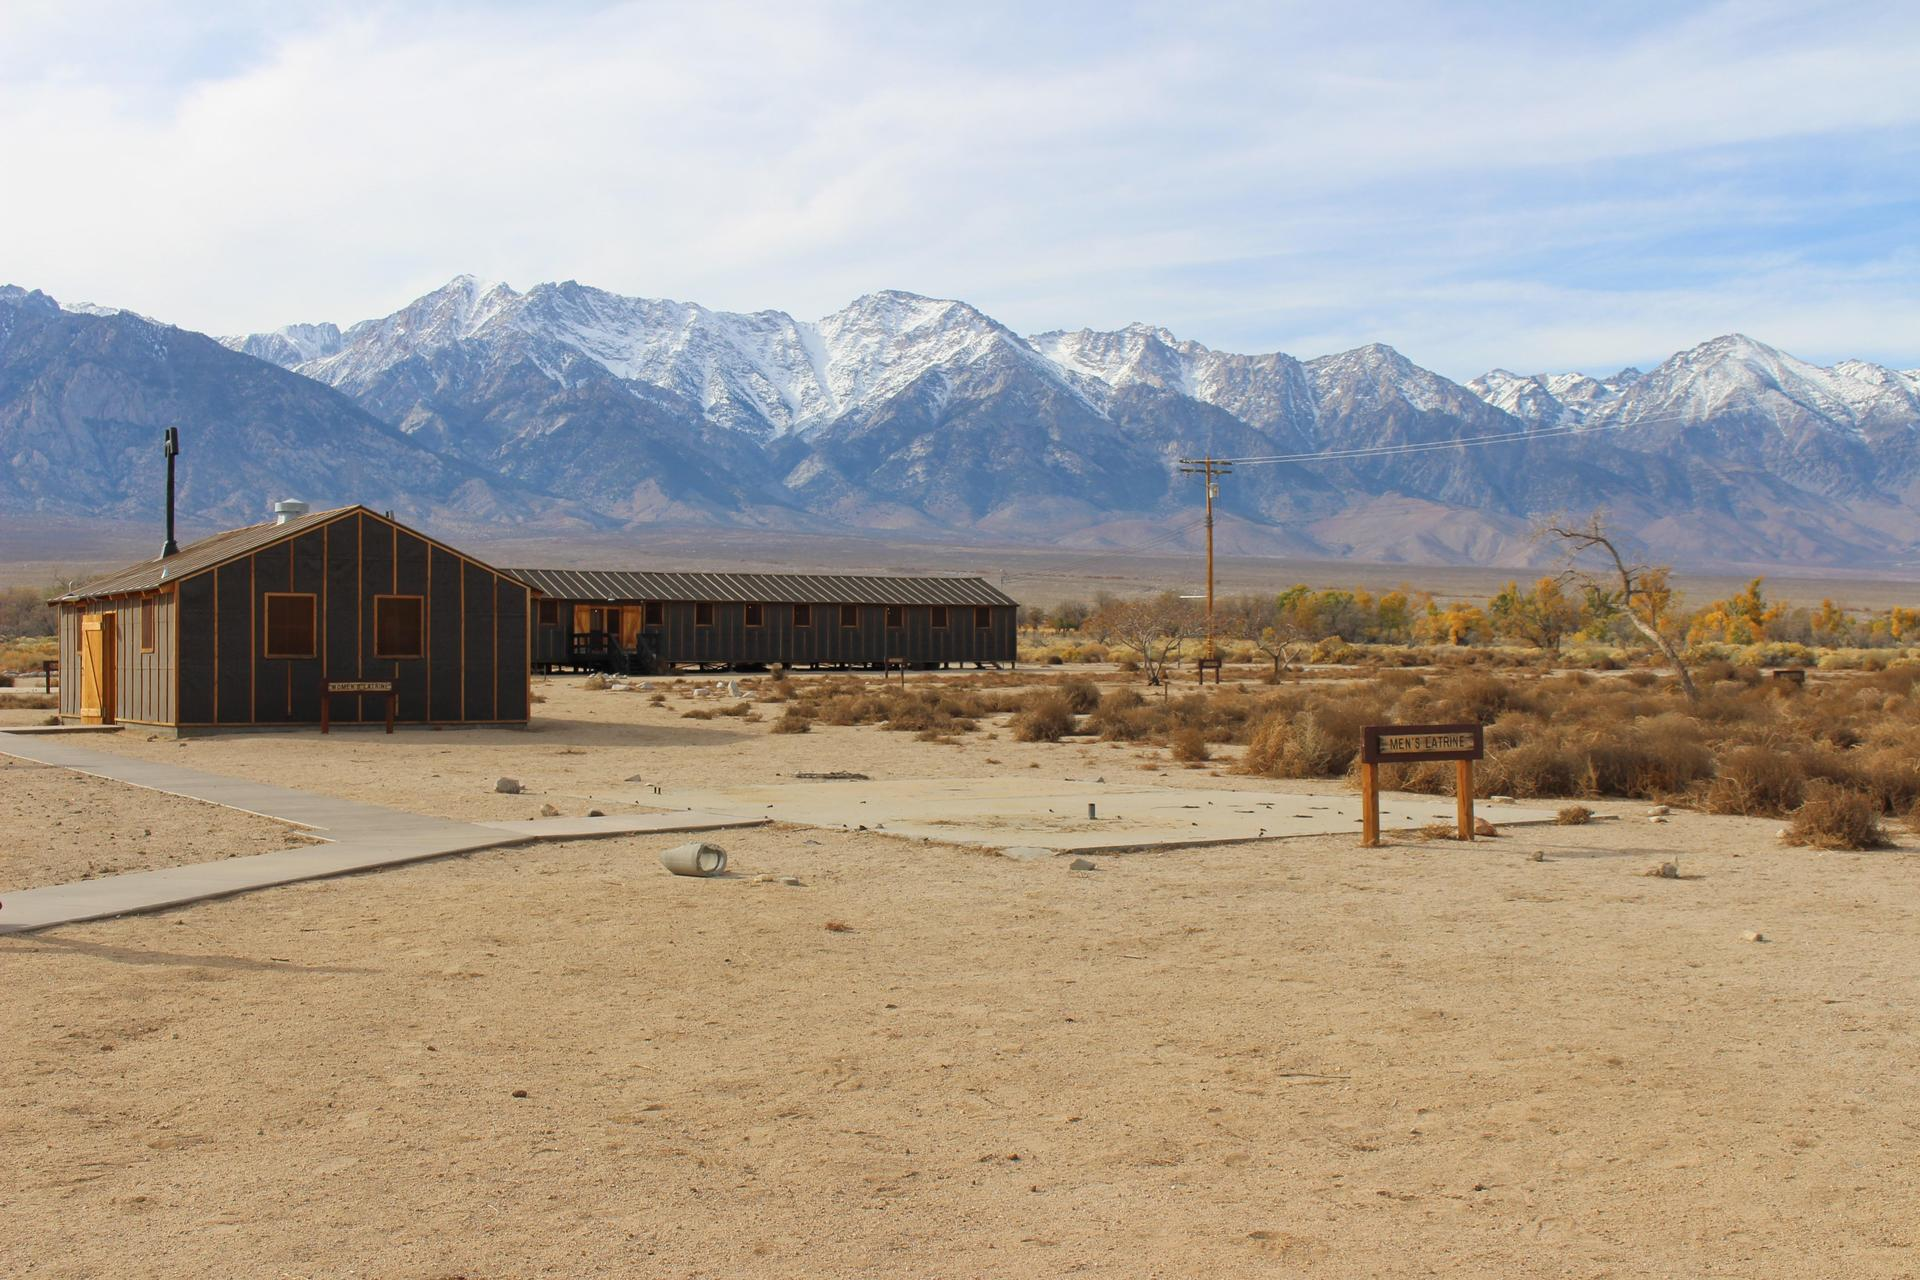 Barracks at Manzanar and Sierras